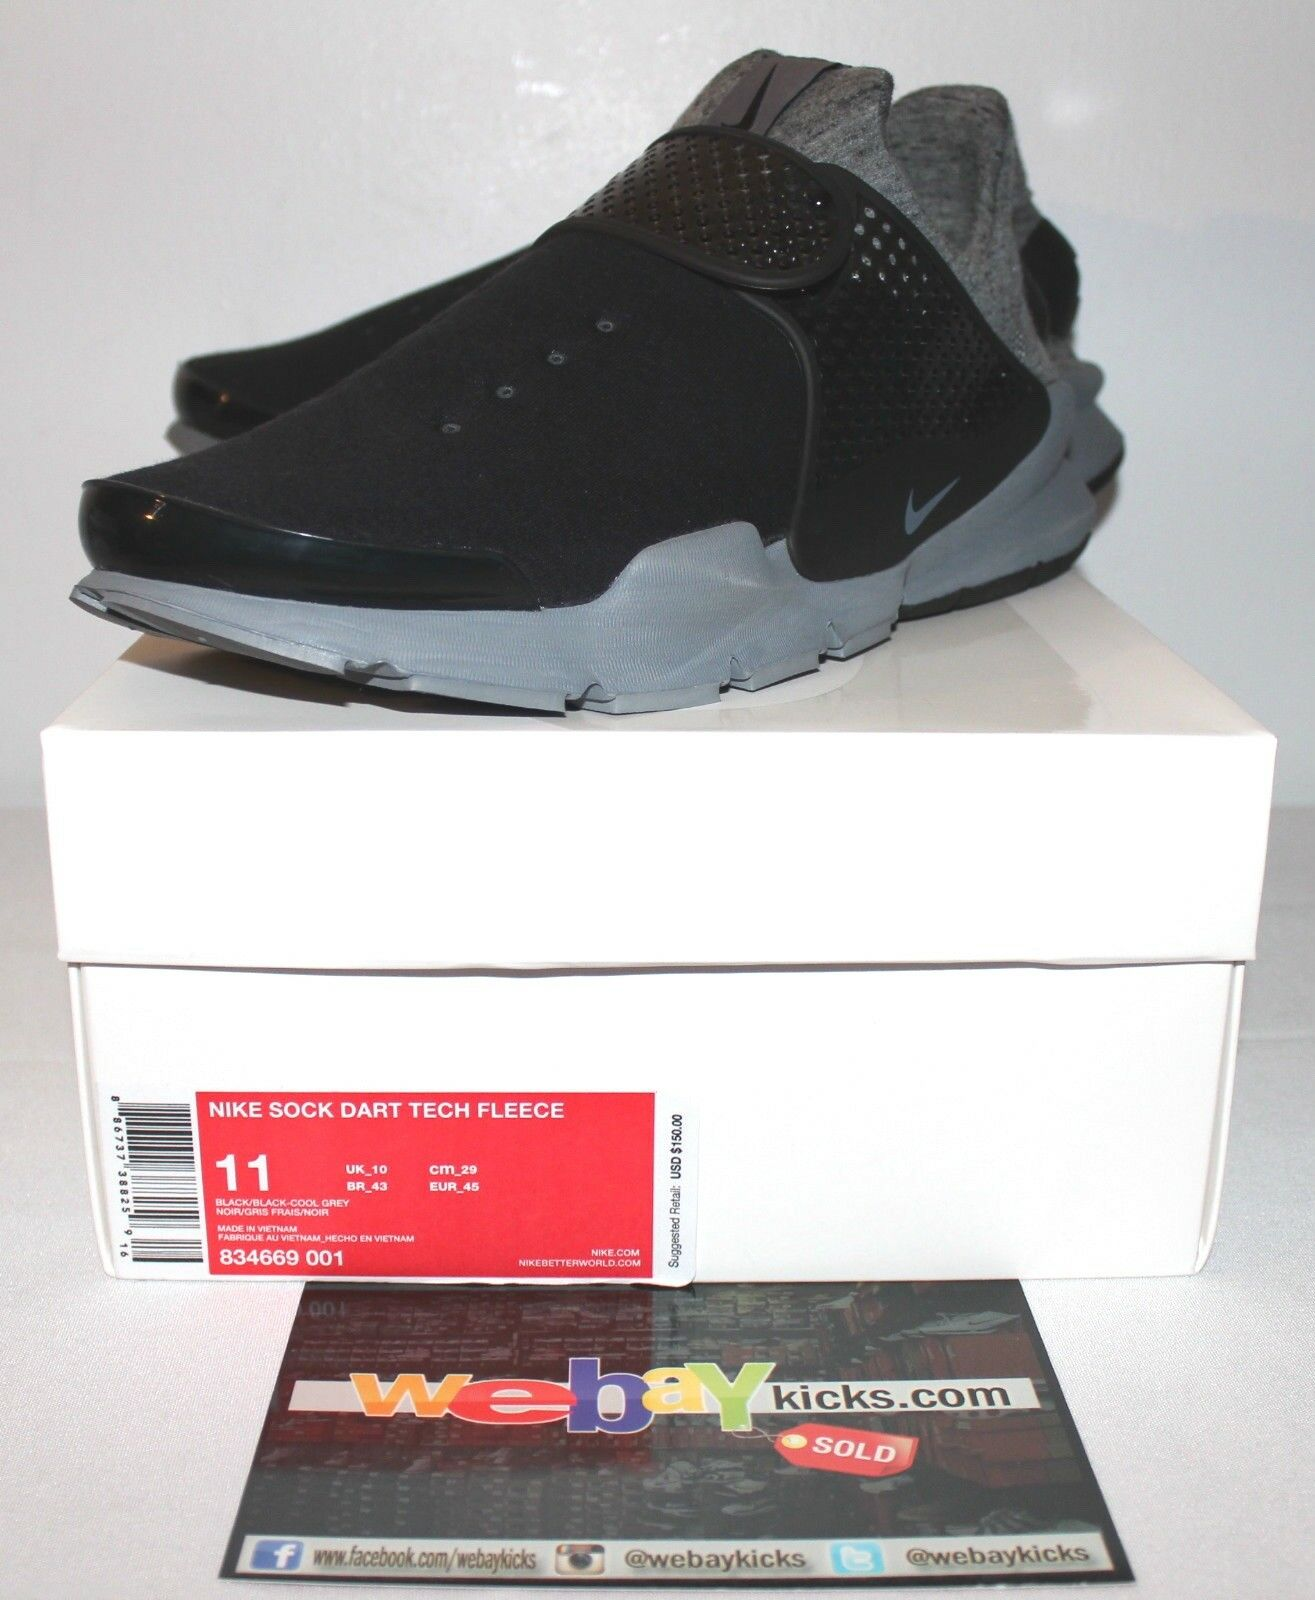 Nike Air Sock Dart Fleece Black Grey Gray Sneakers Men's Size 11 New